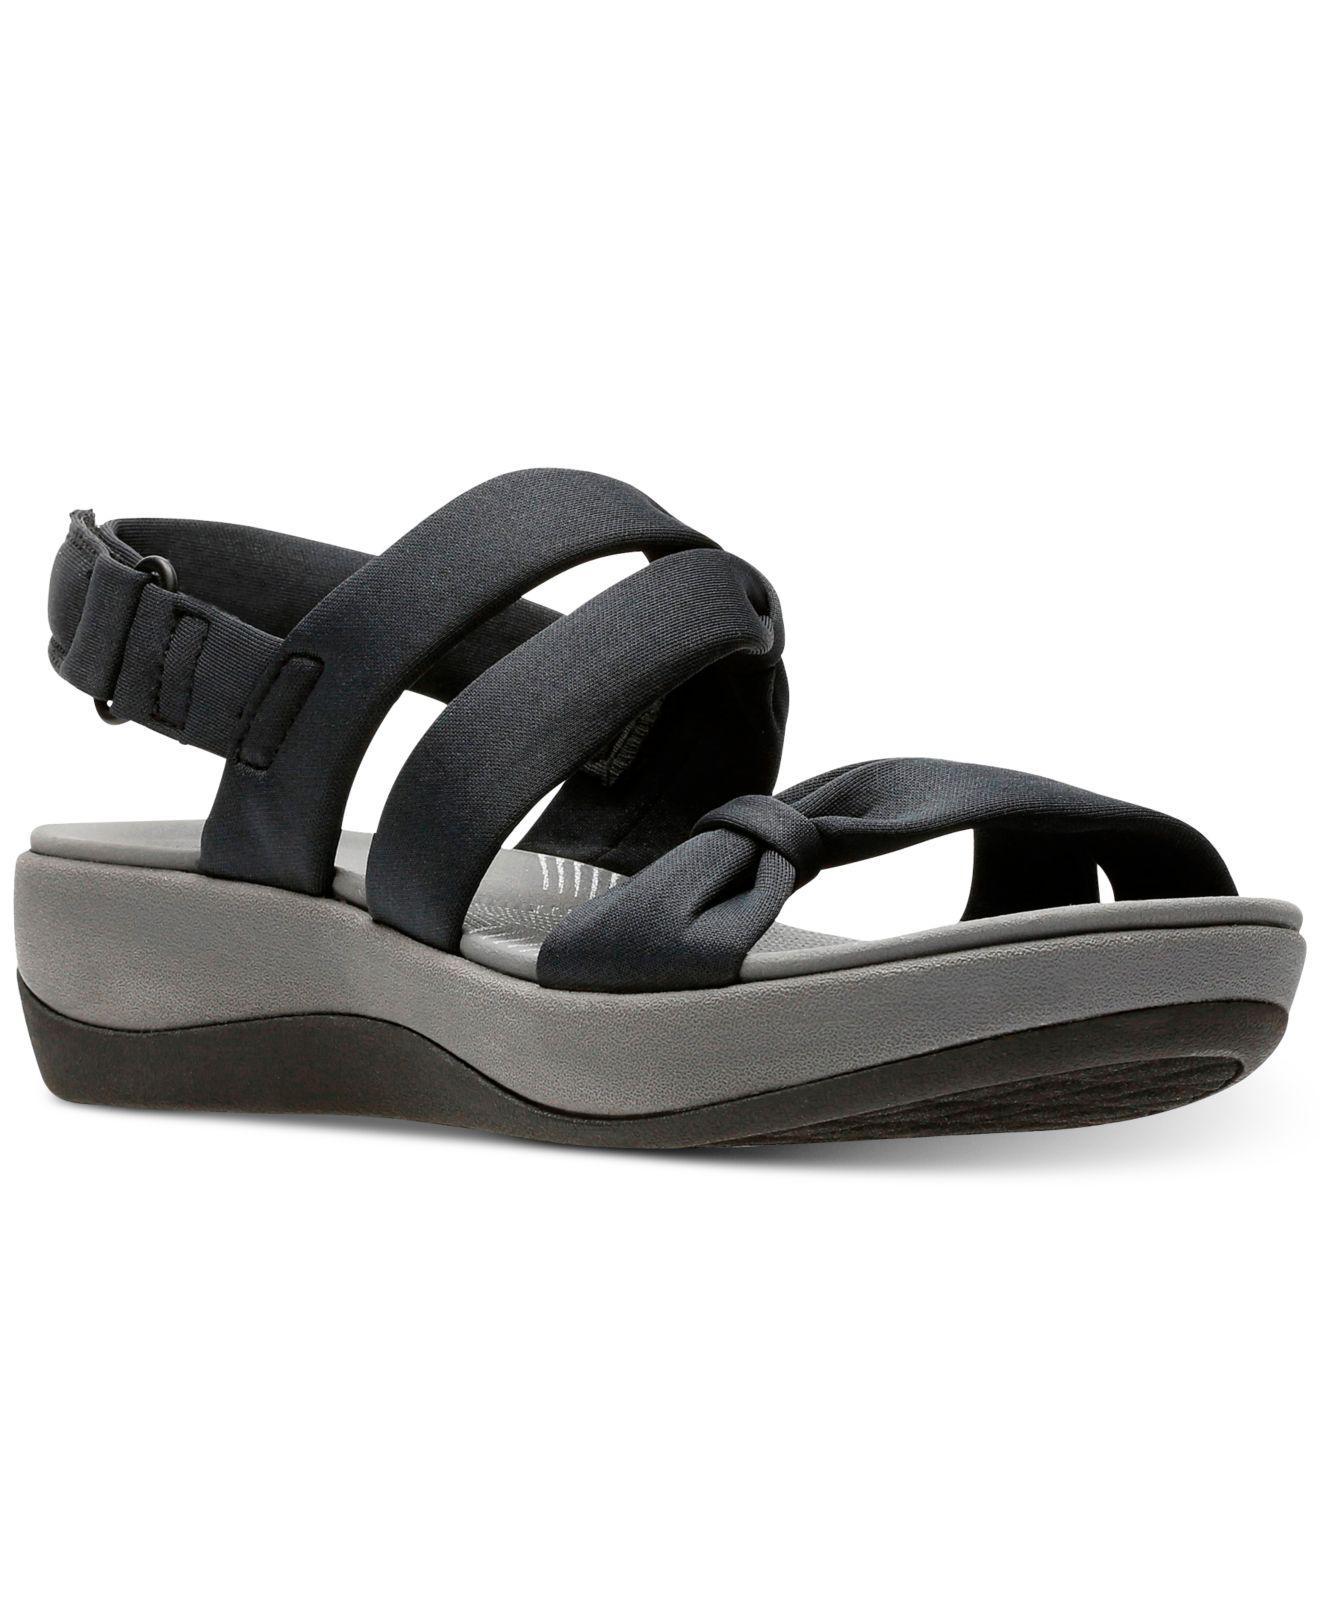 87969be6c73 Lyst - Clarks Cloudsteppers Arla Mae Wedge Sandals in Black